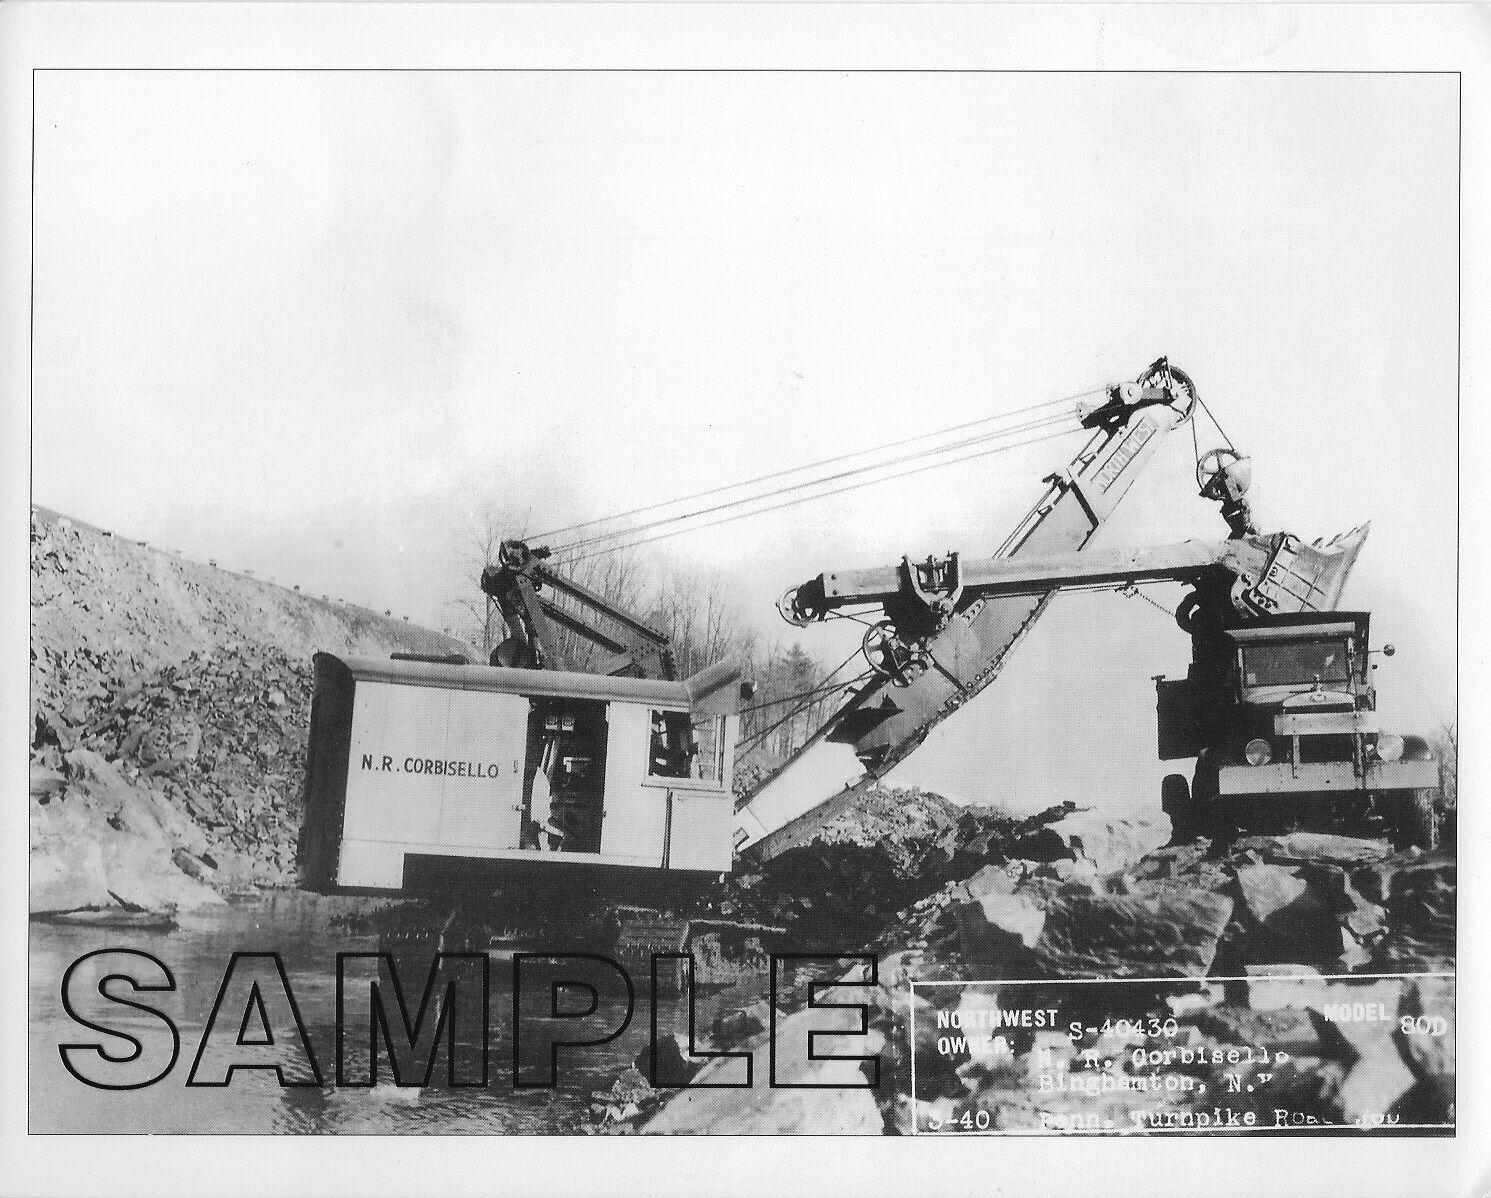 1940 NORTHWEST 80D & MACK F Series, N R CORBISELLO, Inc Binghamton, NY B&W Photo